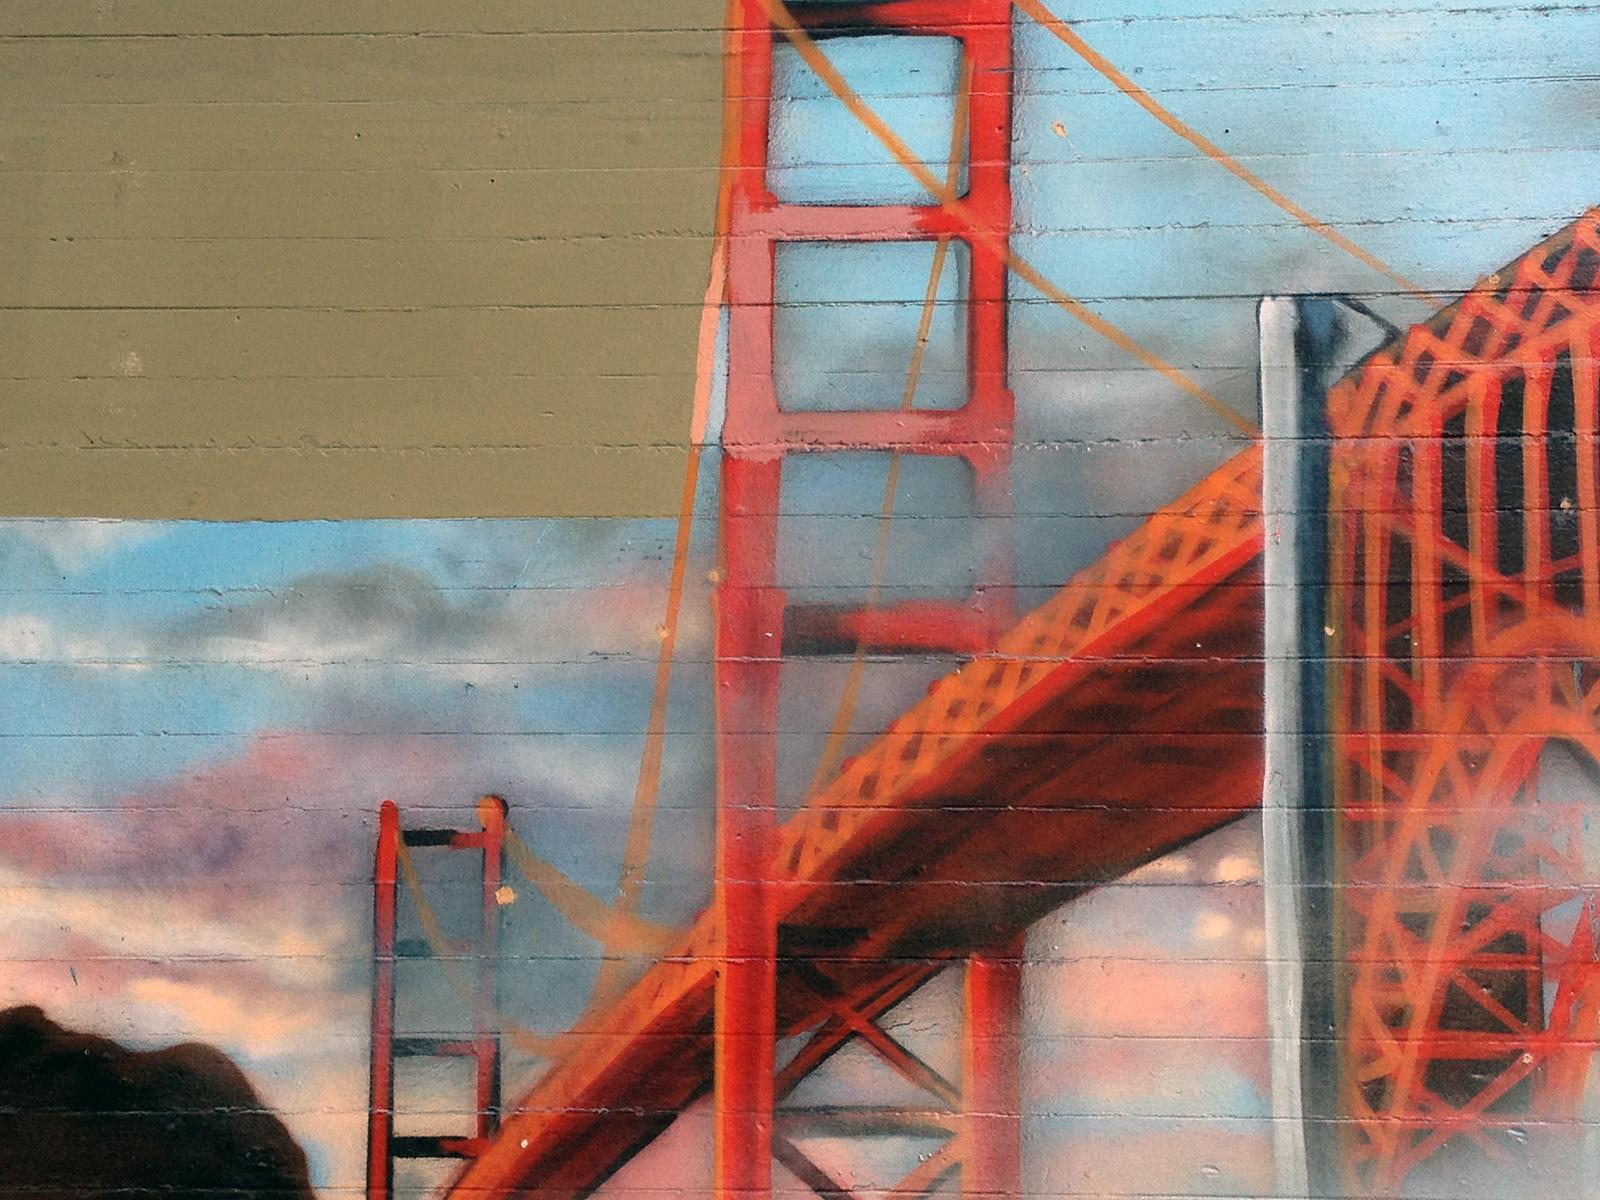 A mural of the Golden Gate Bridge off of Folsom Street.